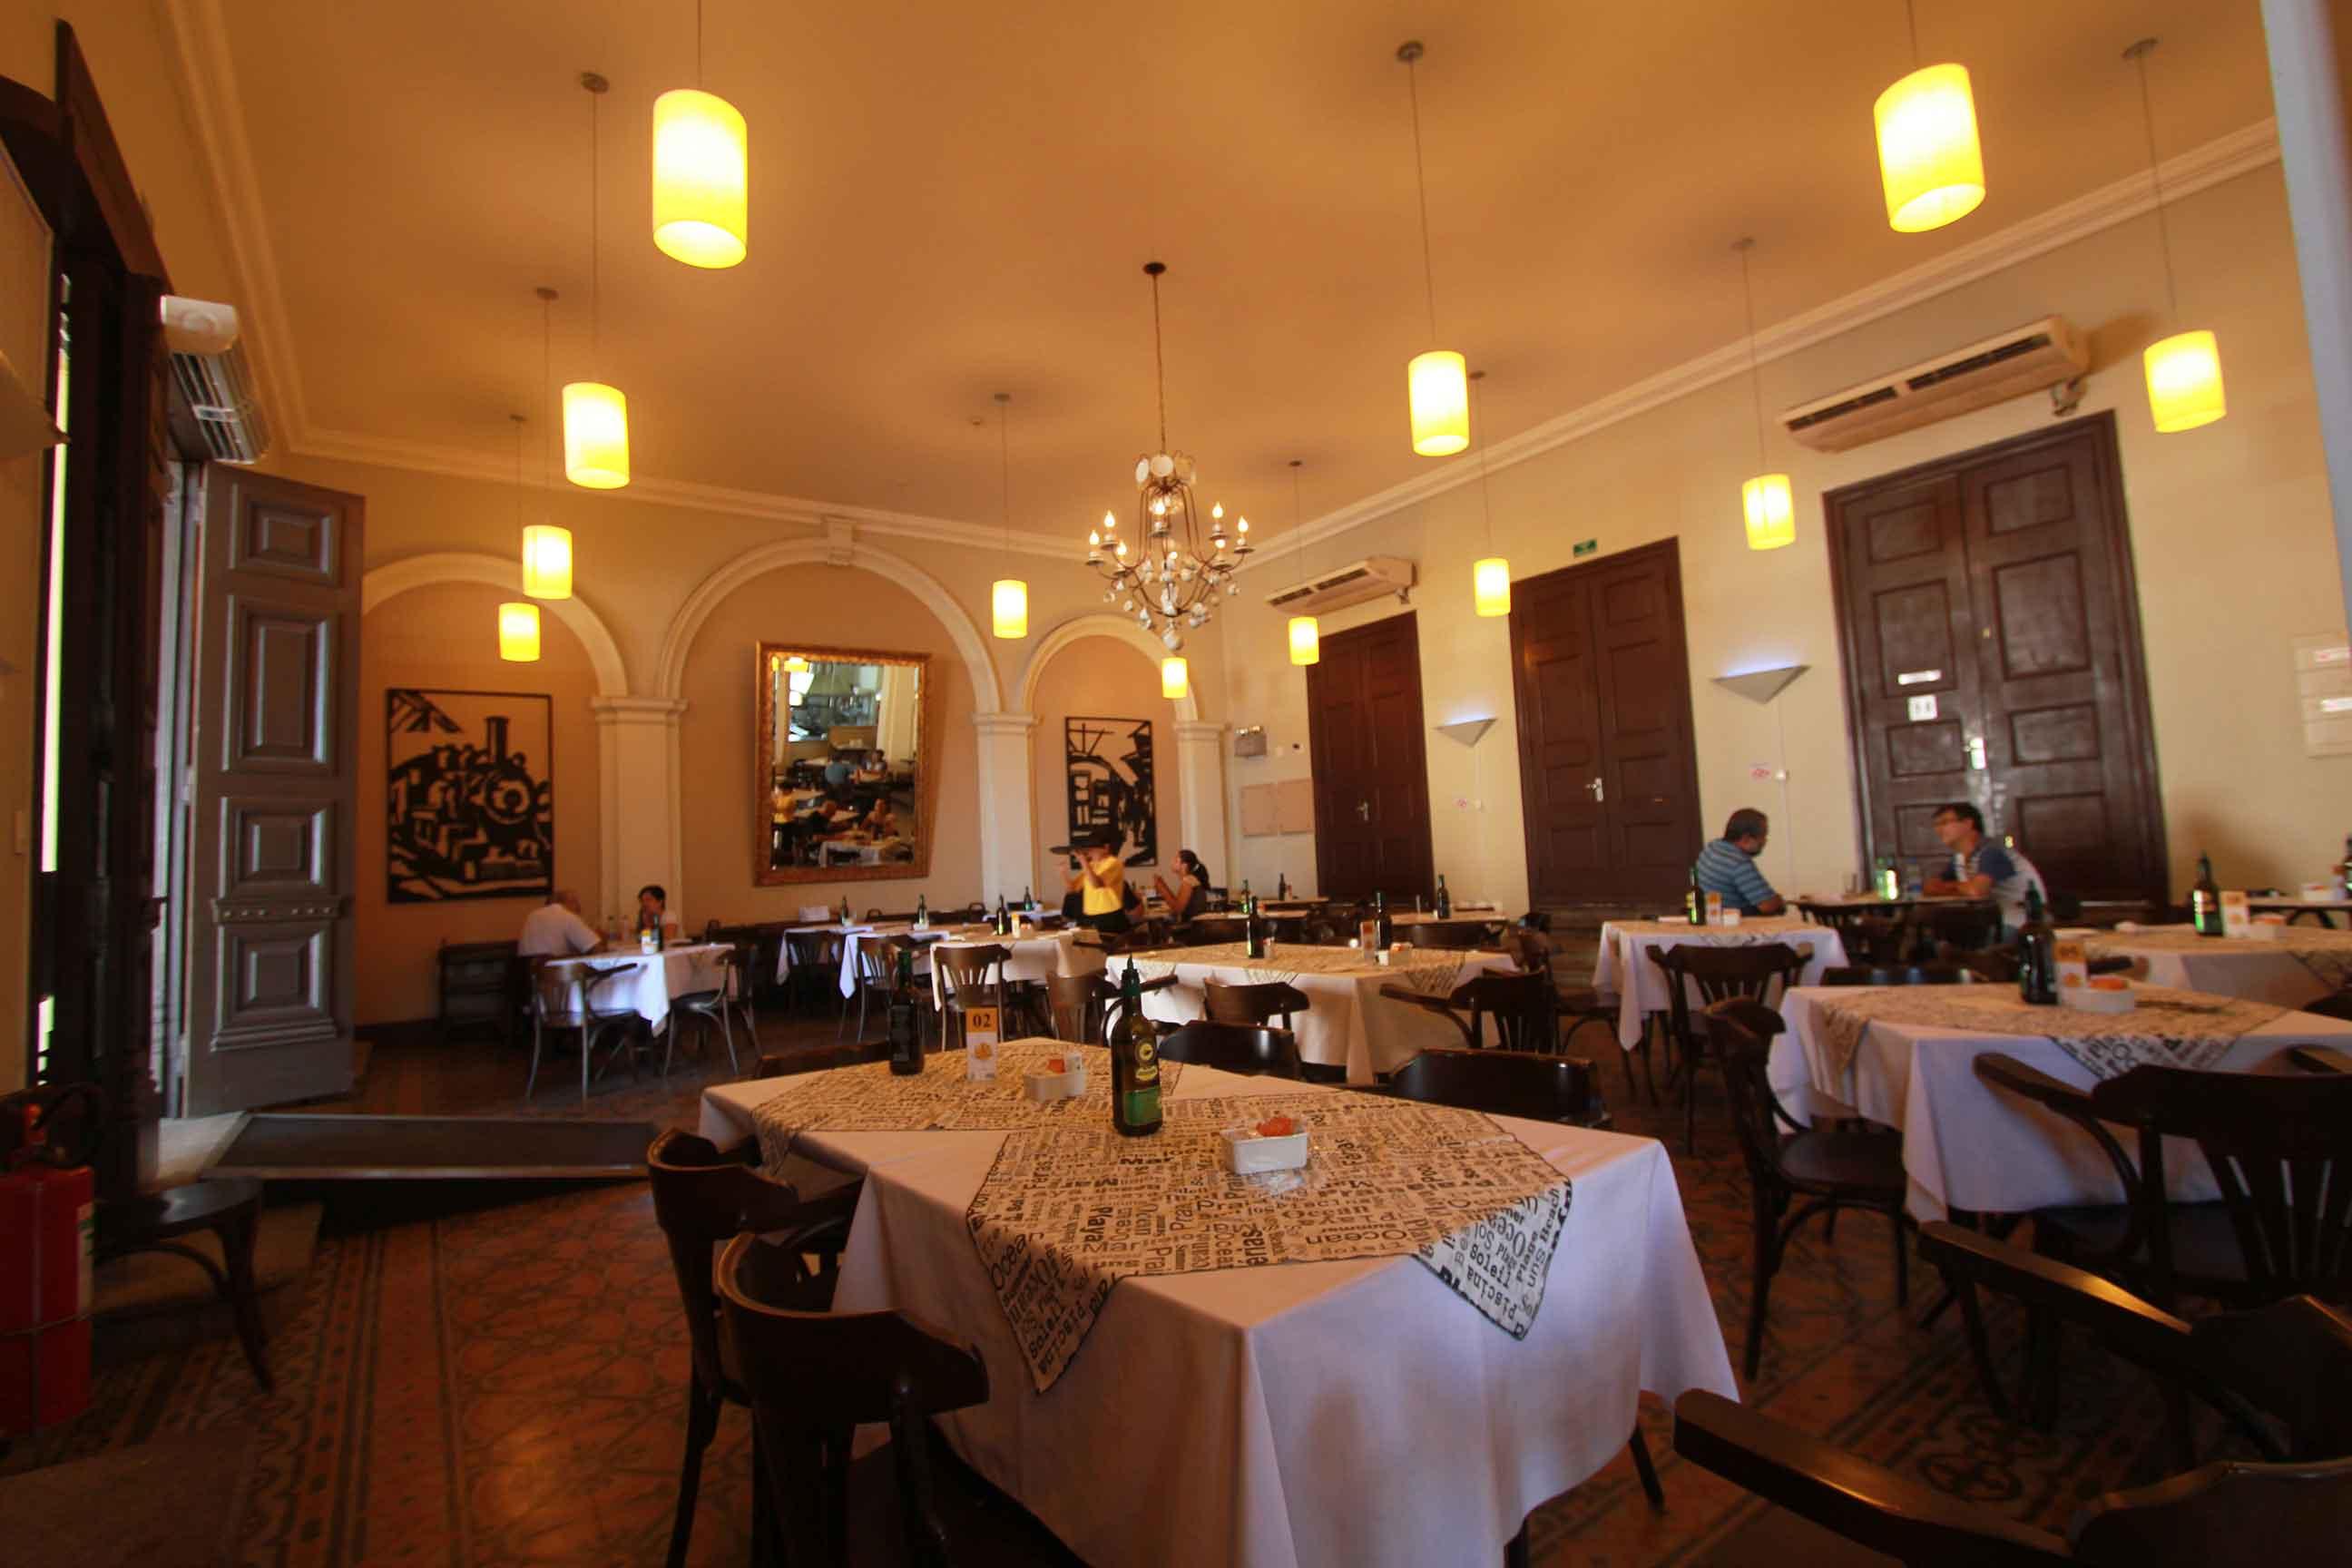 santos-turismo-gastronomia-restaurante-escola-bistro-bx